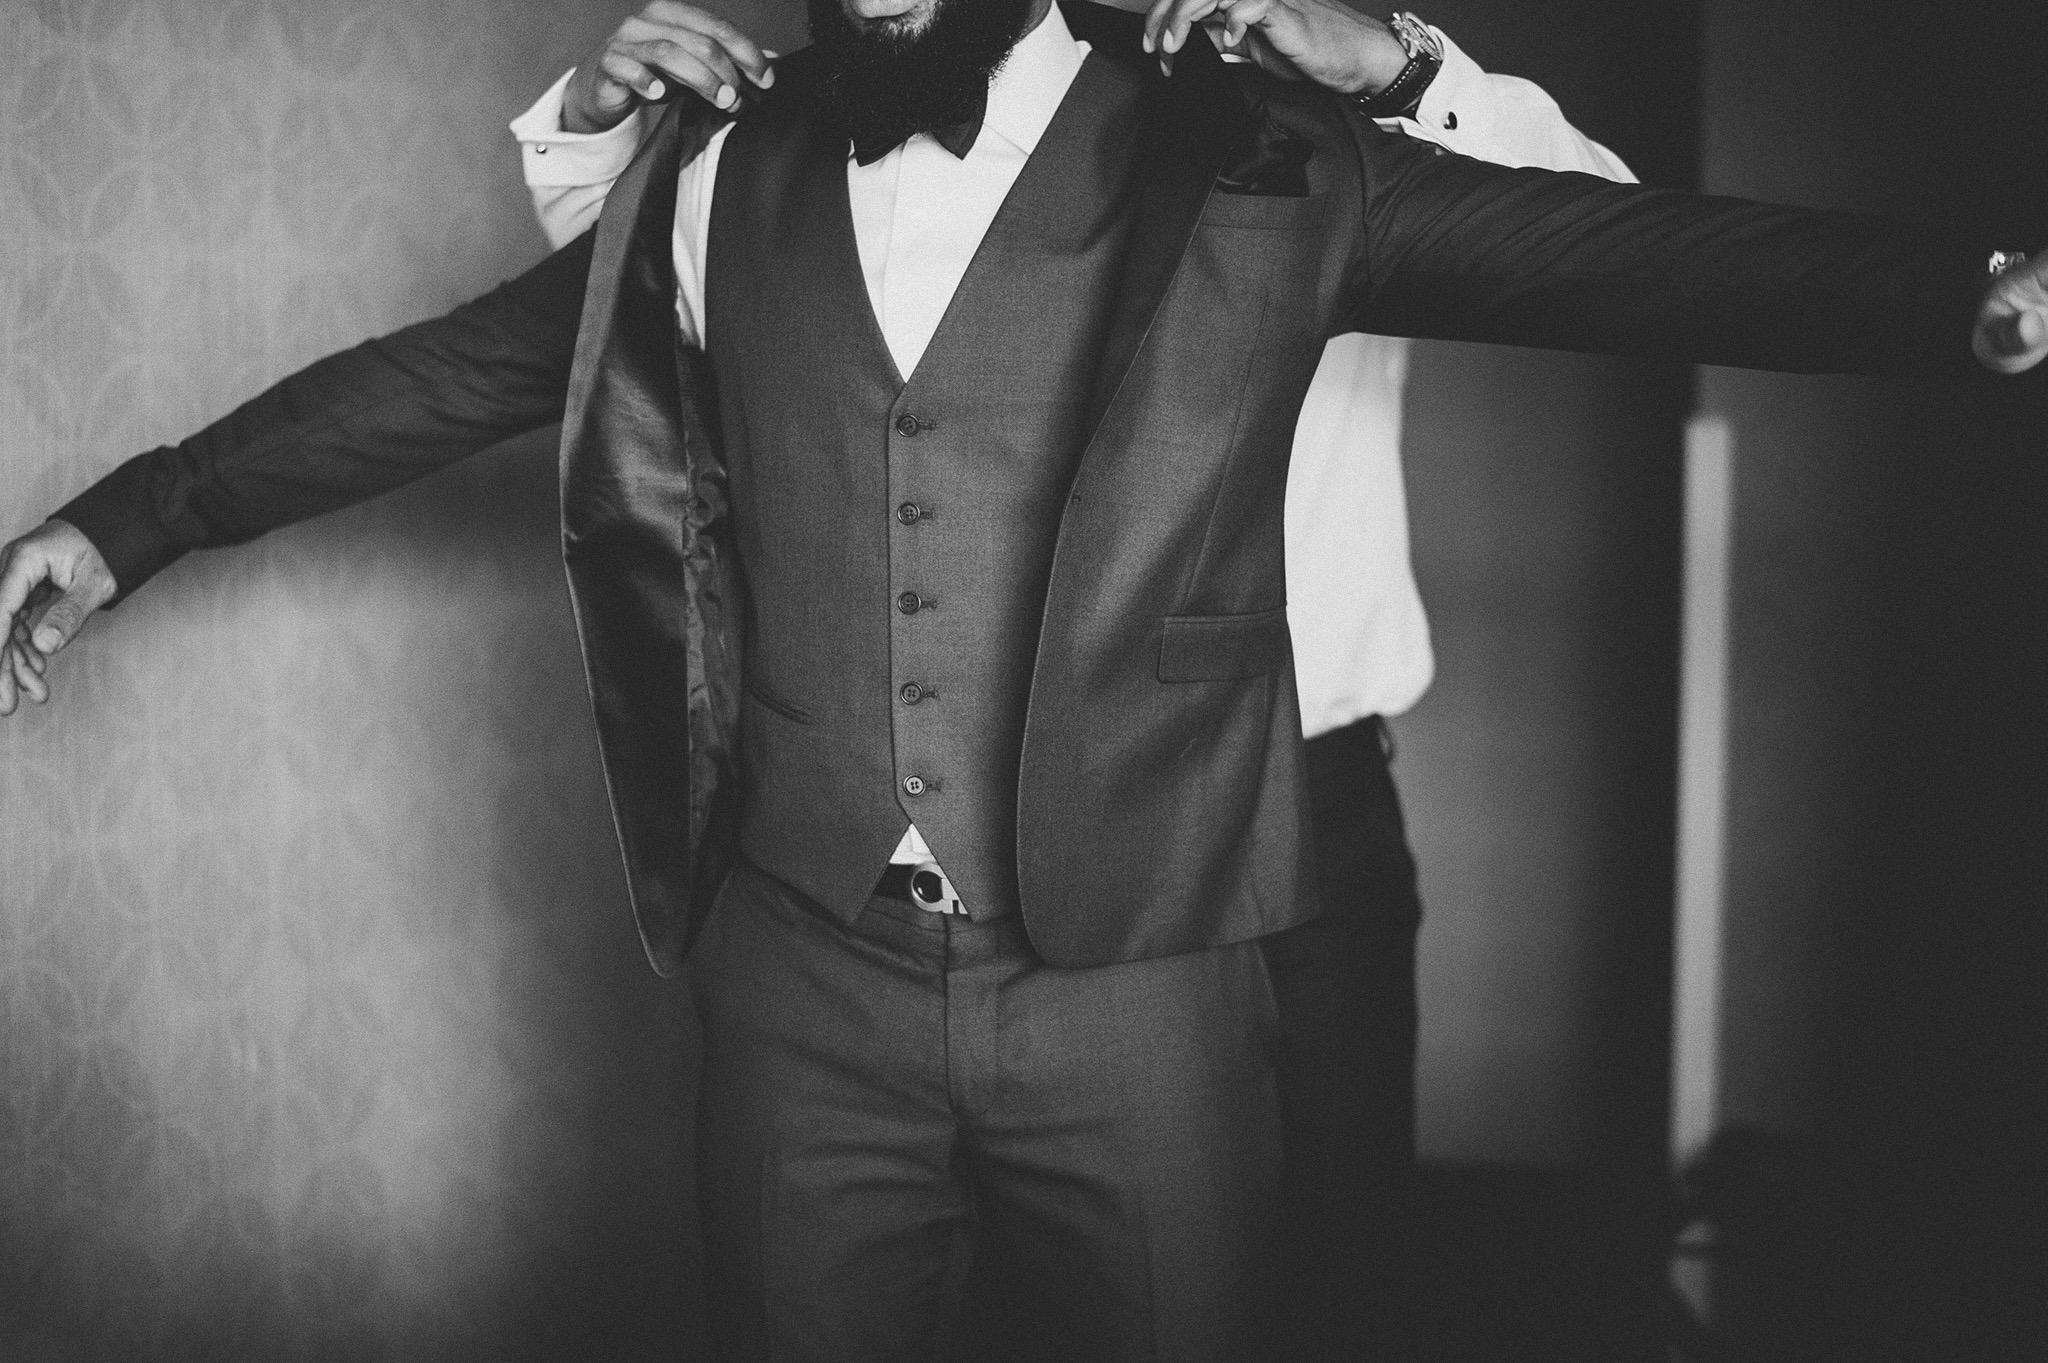 09-groom-and-jacket.jpg